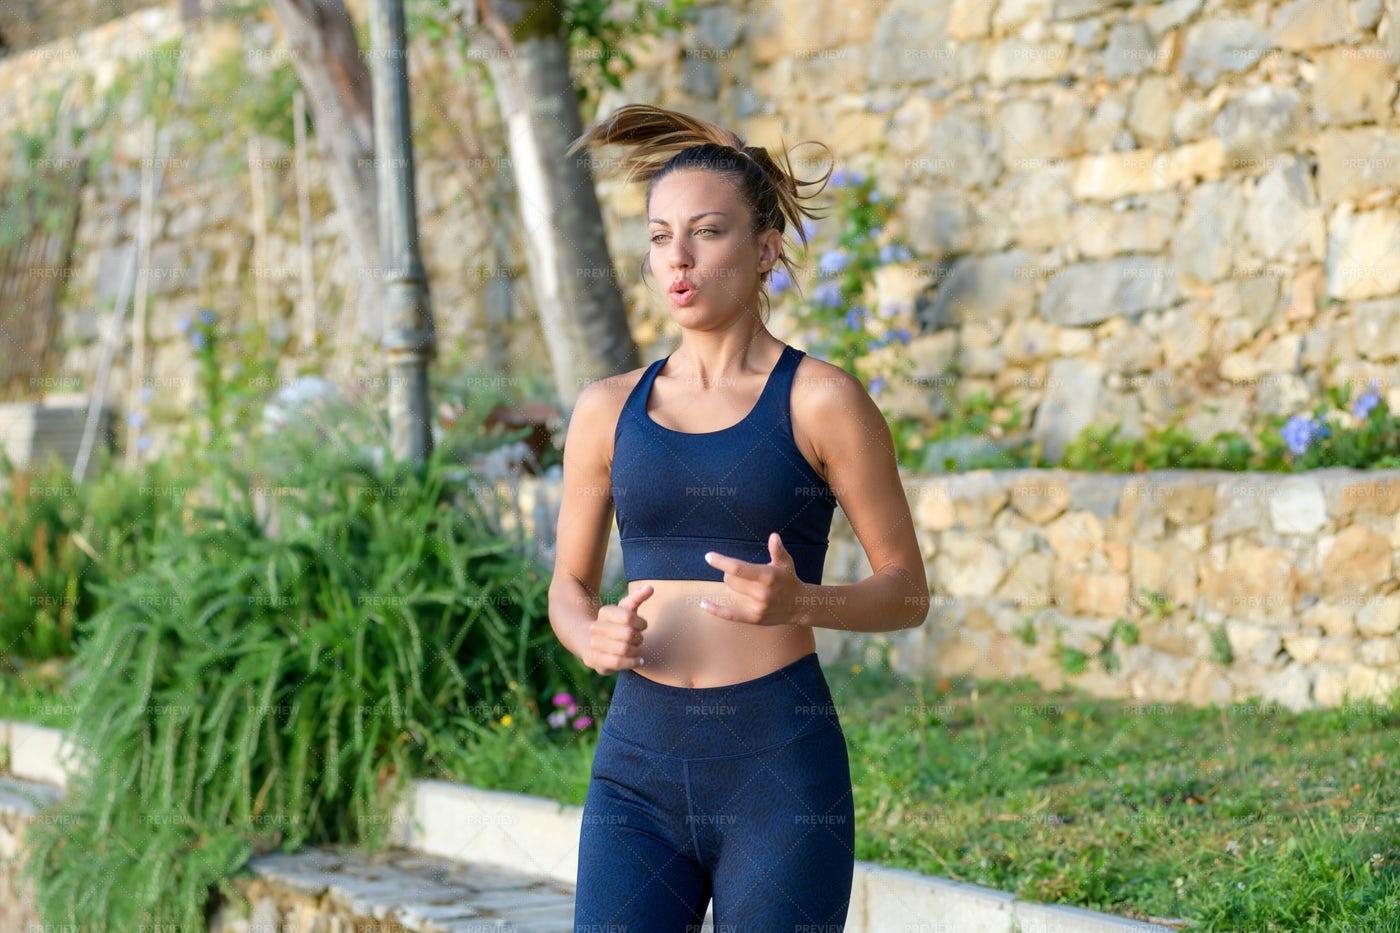 Woman Jogging On The Spot: Stock Photos